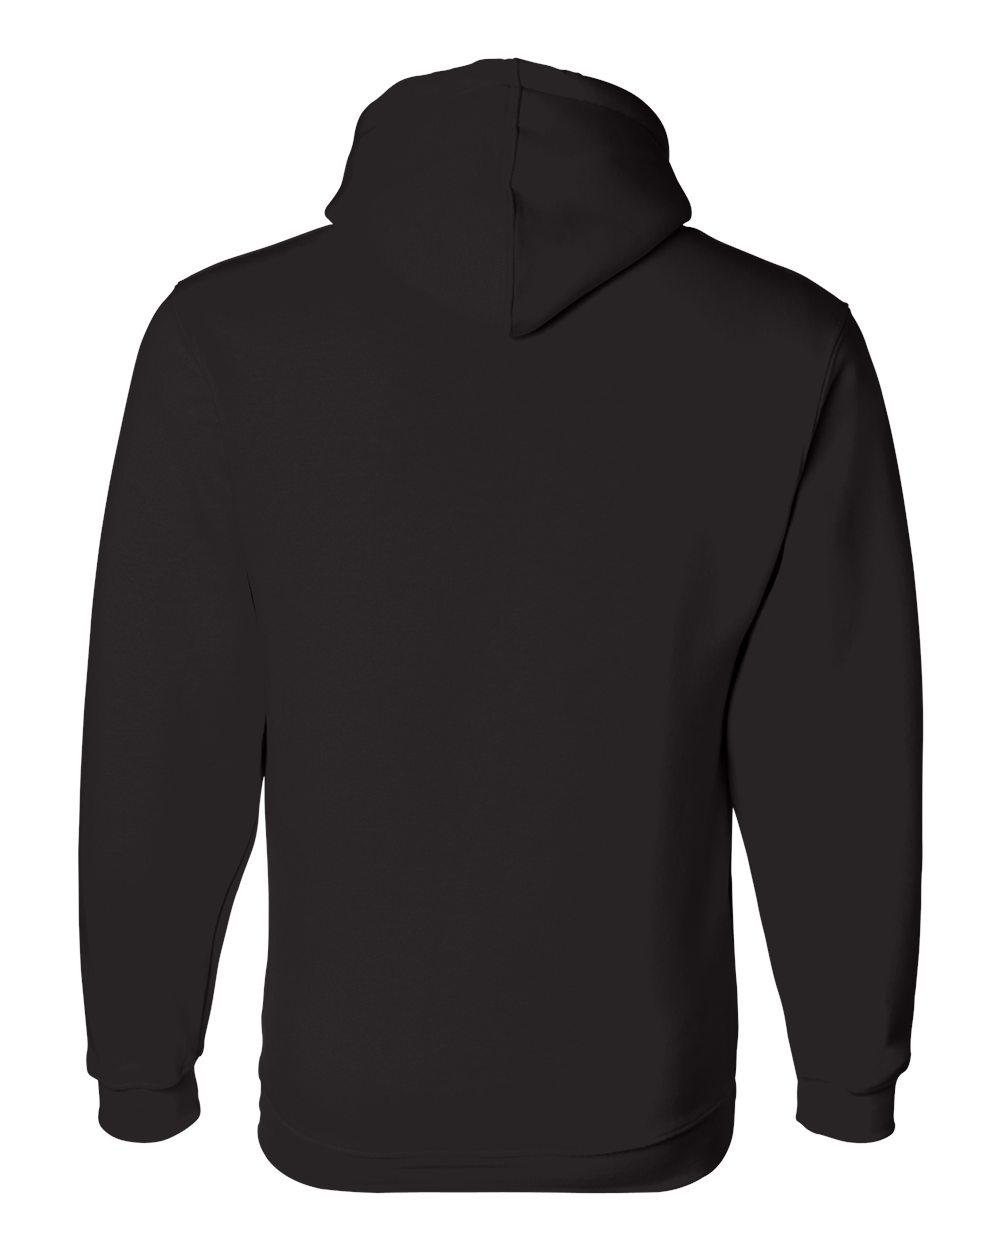 Bayside-Mens-Blank-USA-Made-Hooded-Sweatshirt-960-up-to-6XL miniature 7